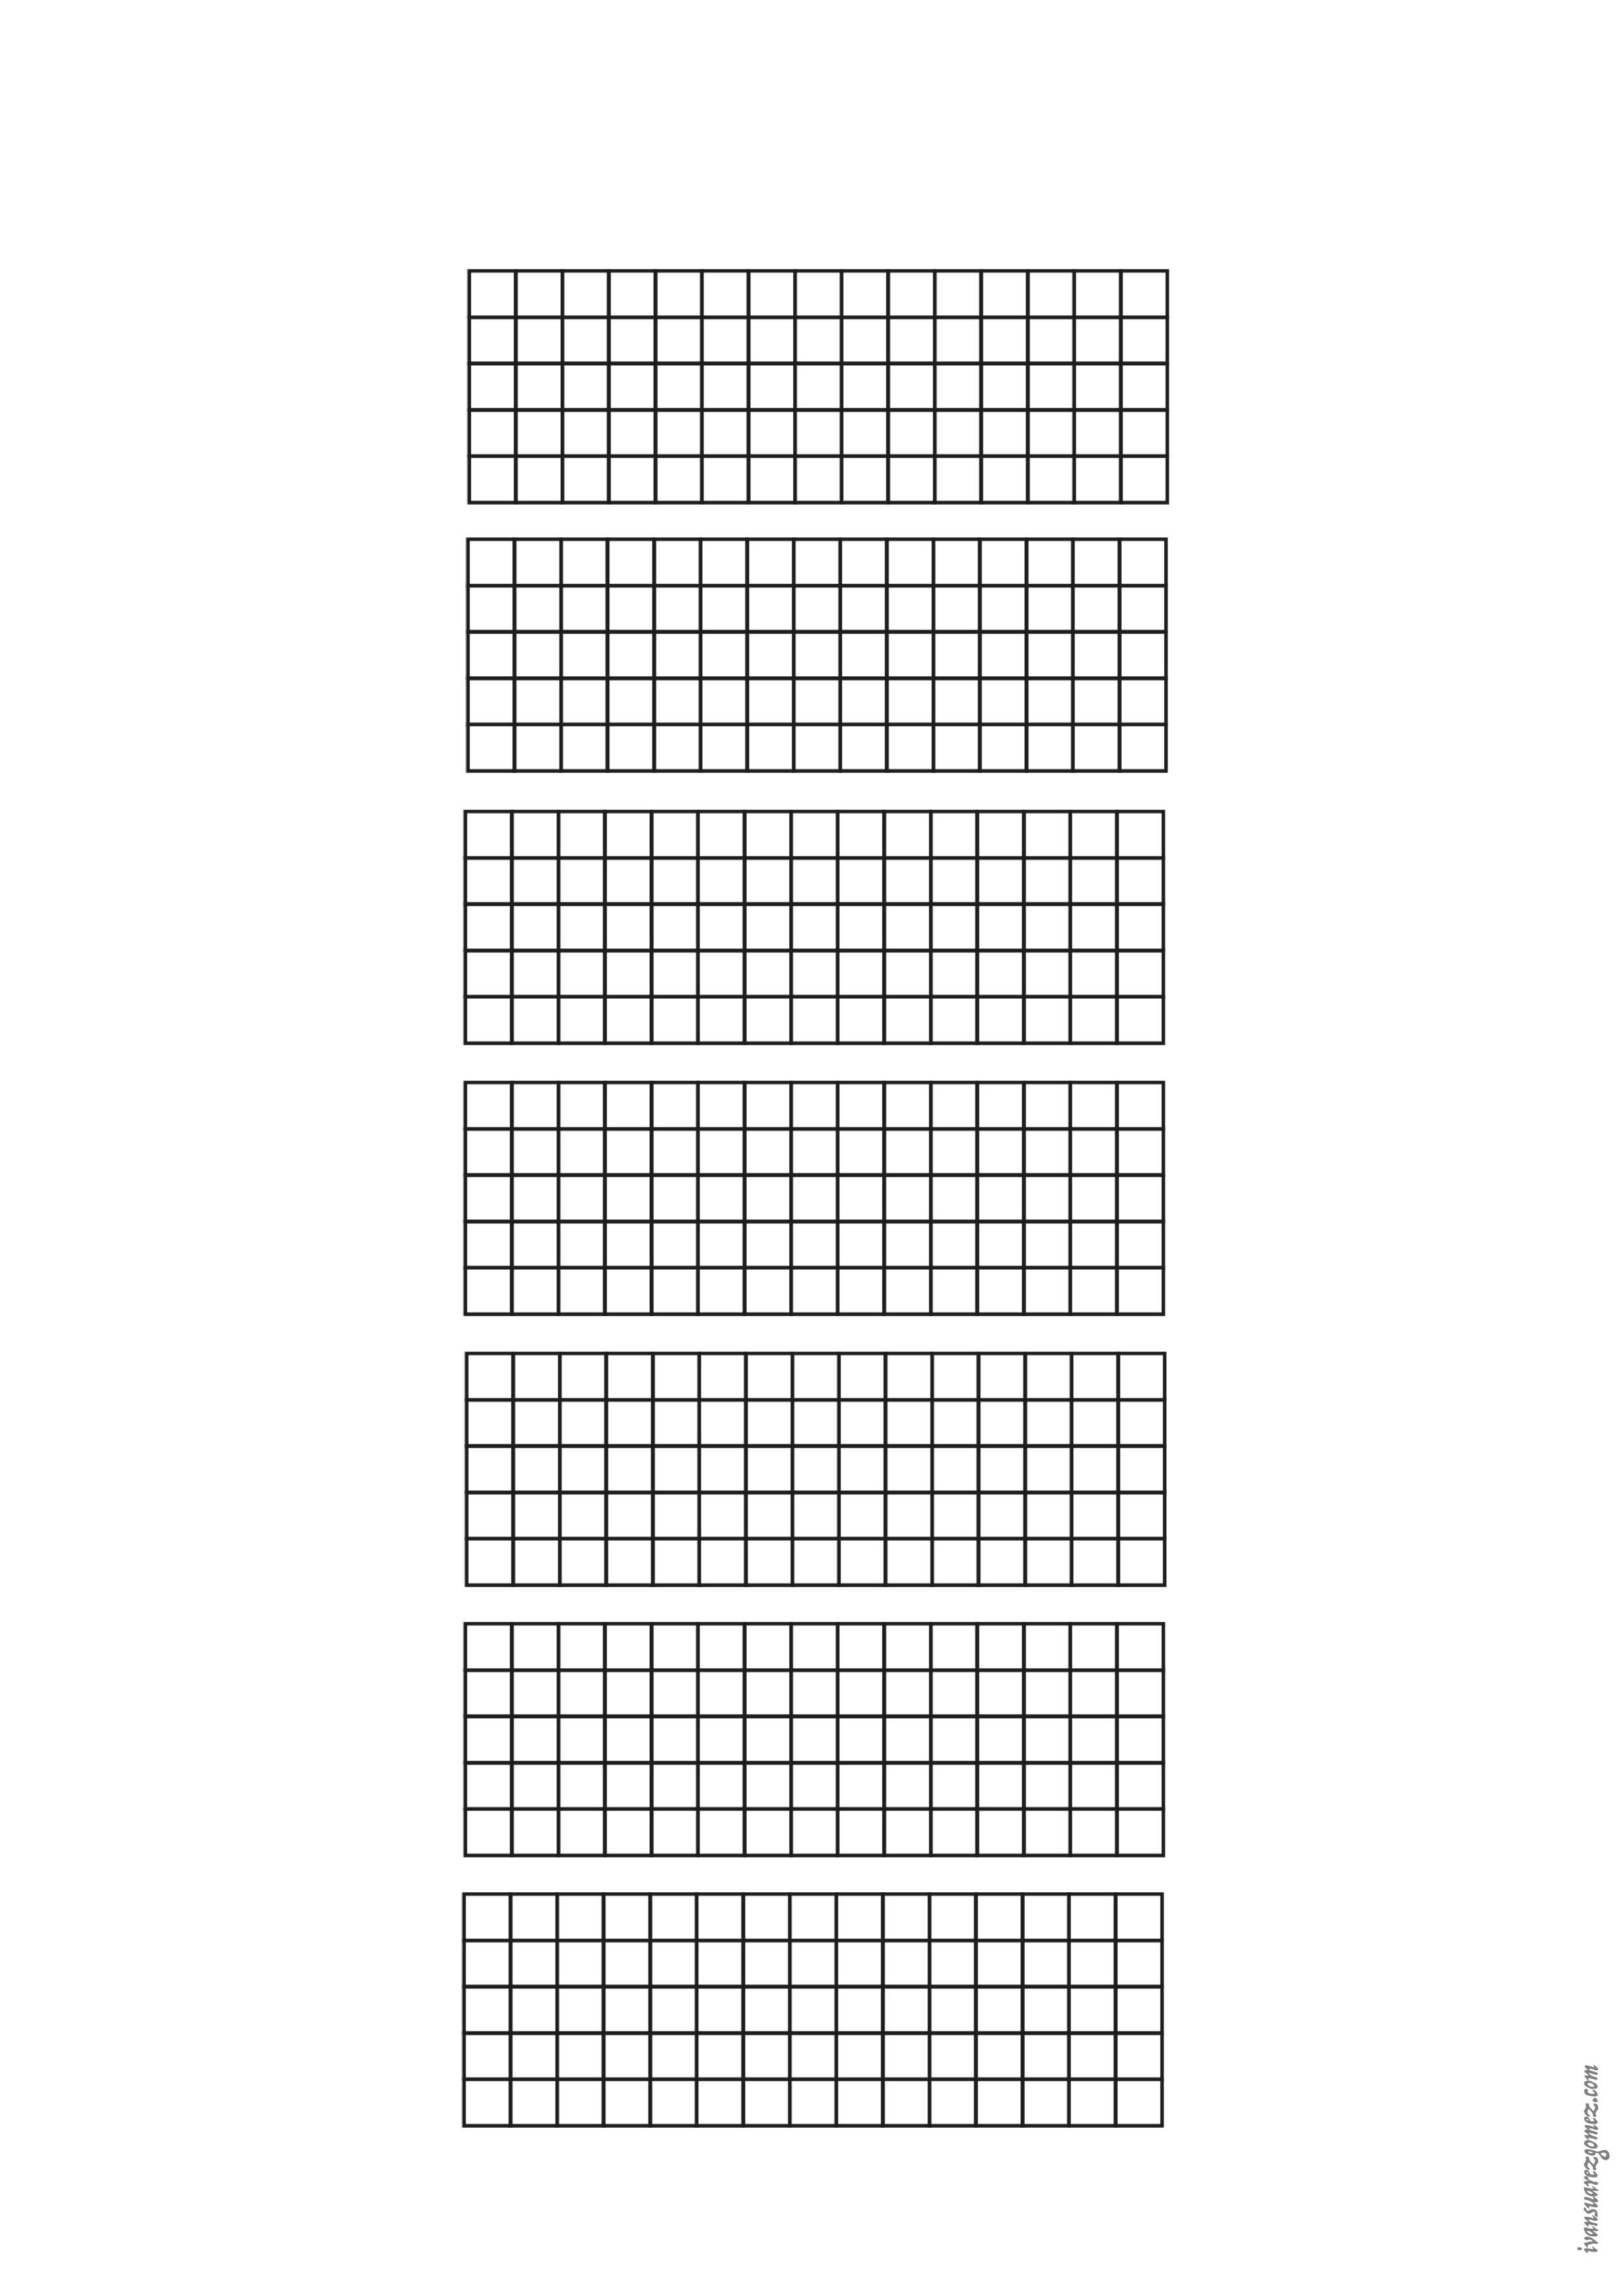 Guitar - 7 white fretboard